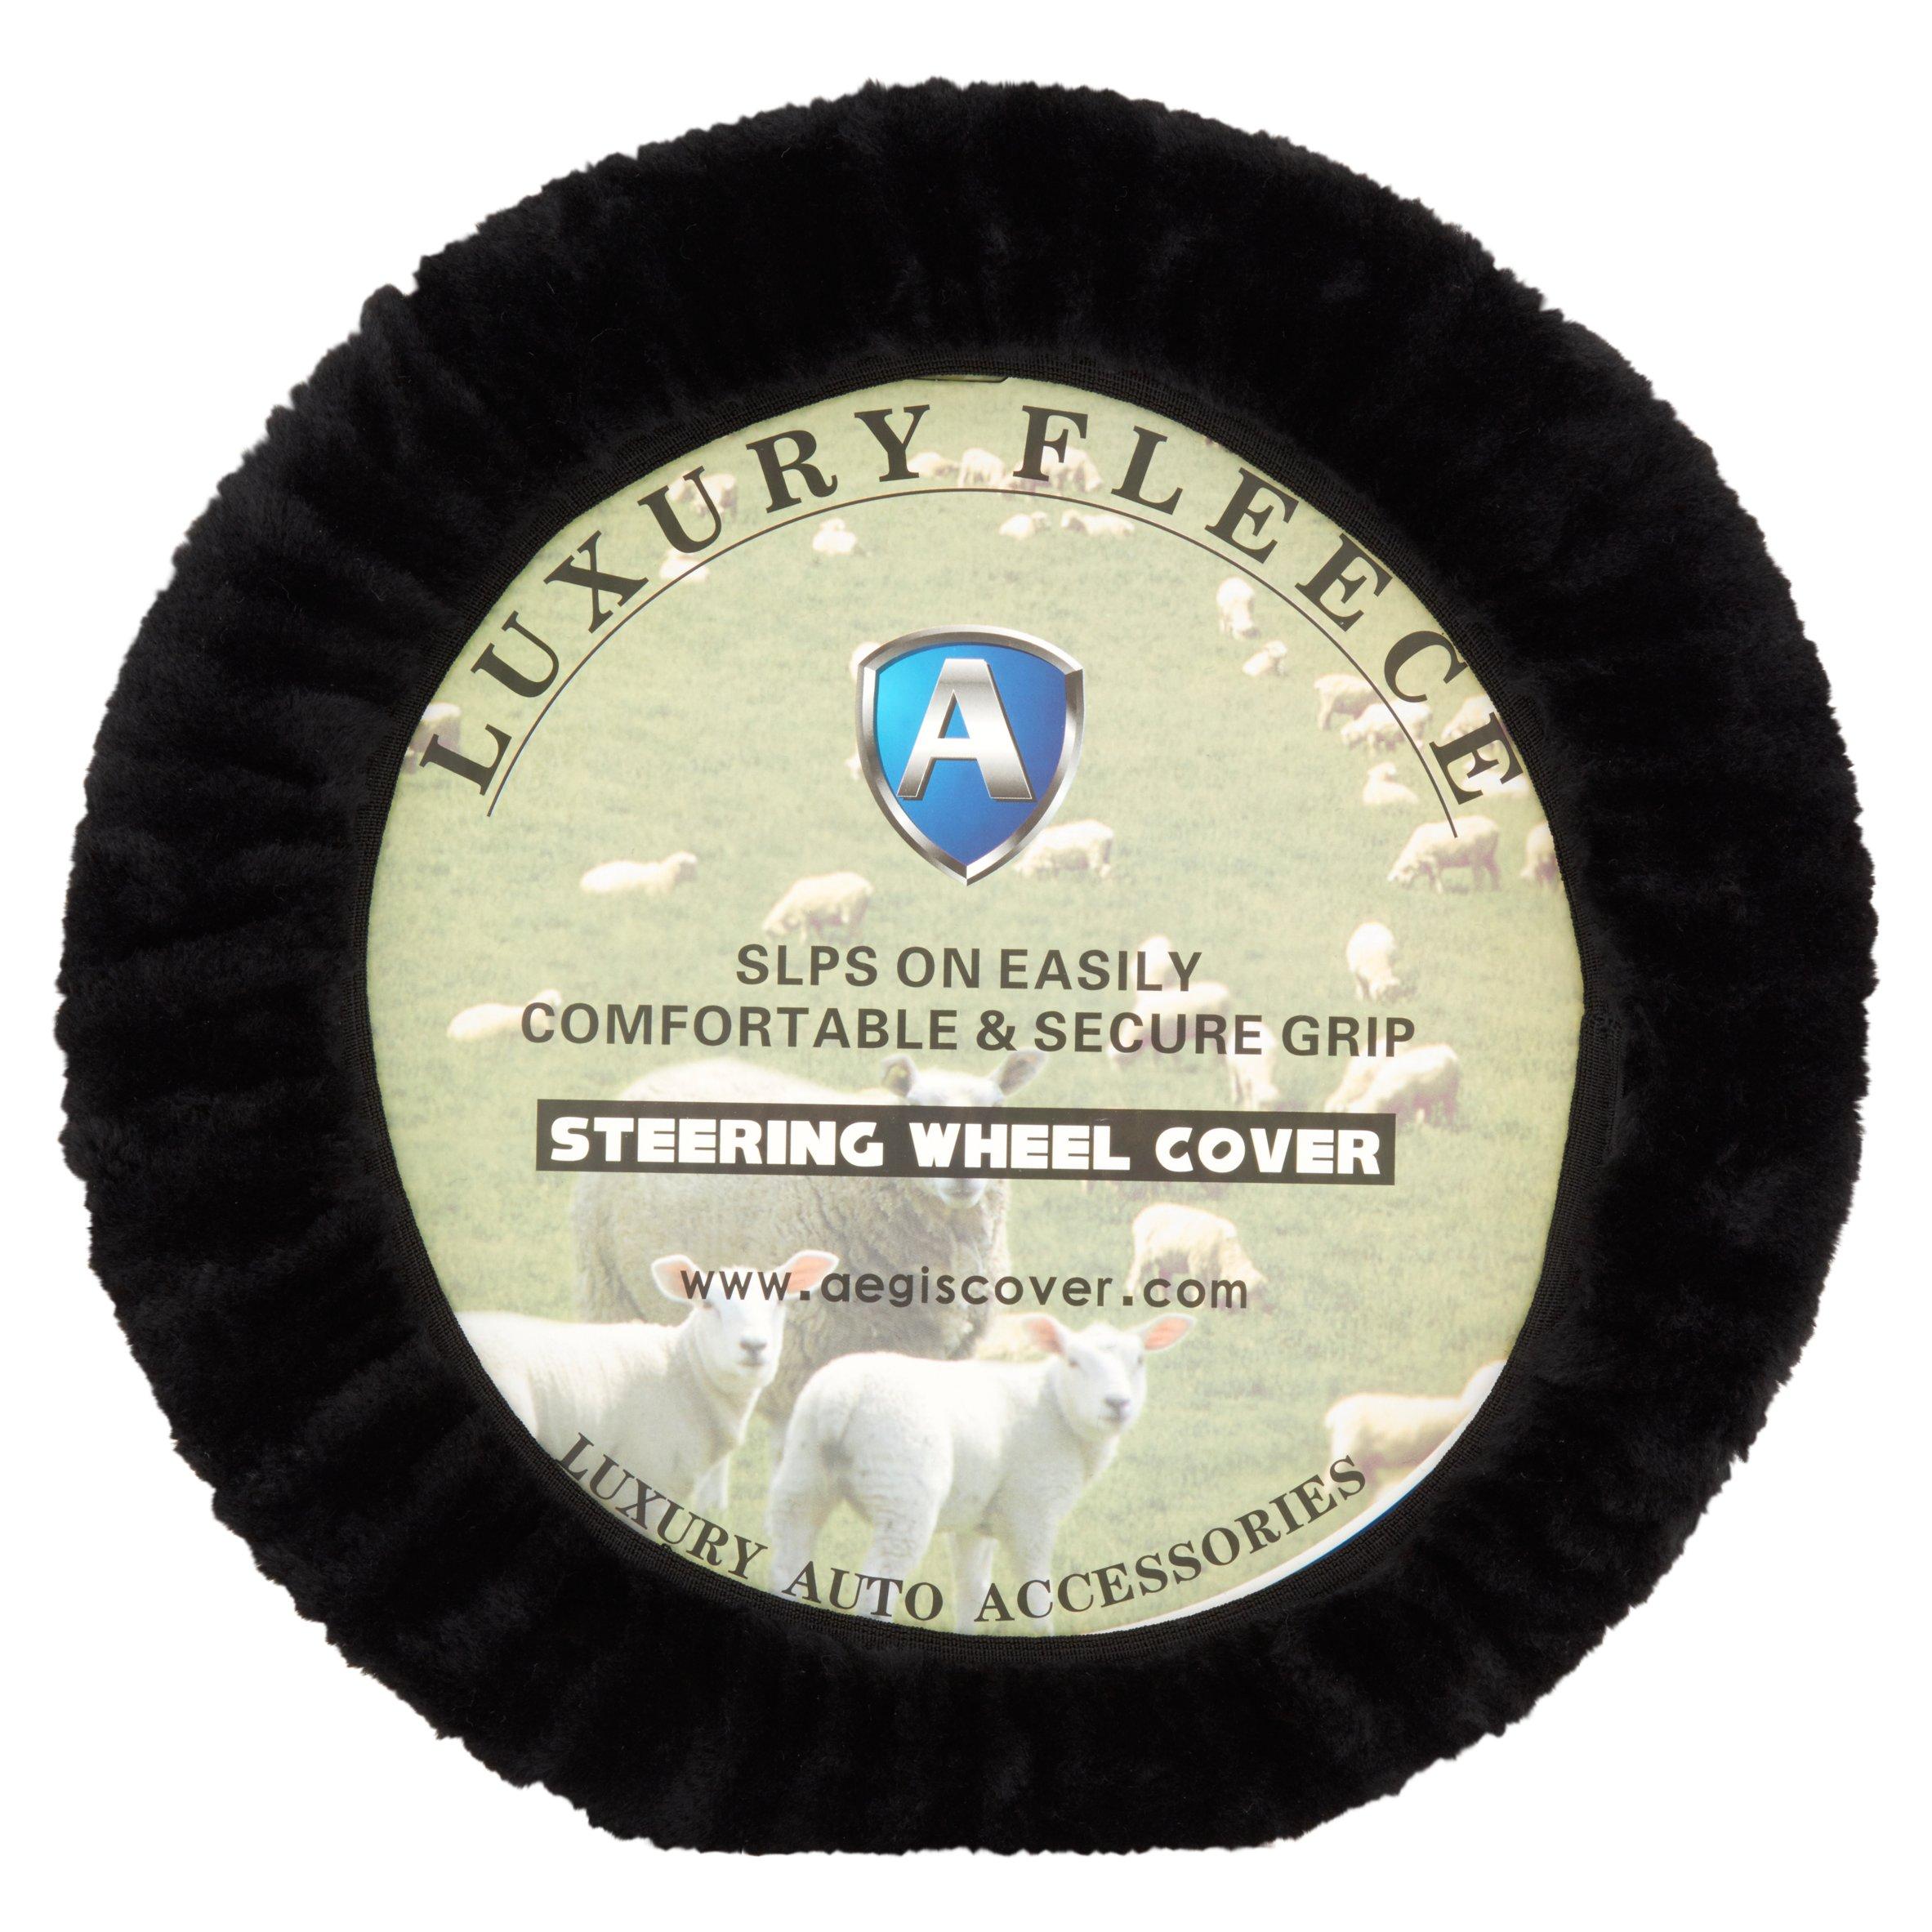 Aegis Cover Luxury Fleece Steering Wheel Cover